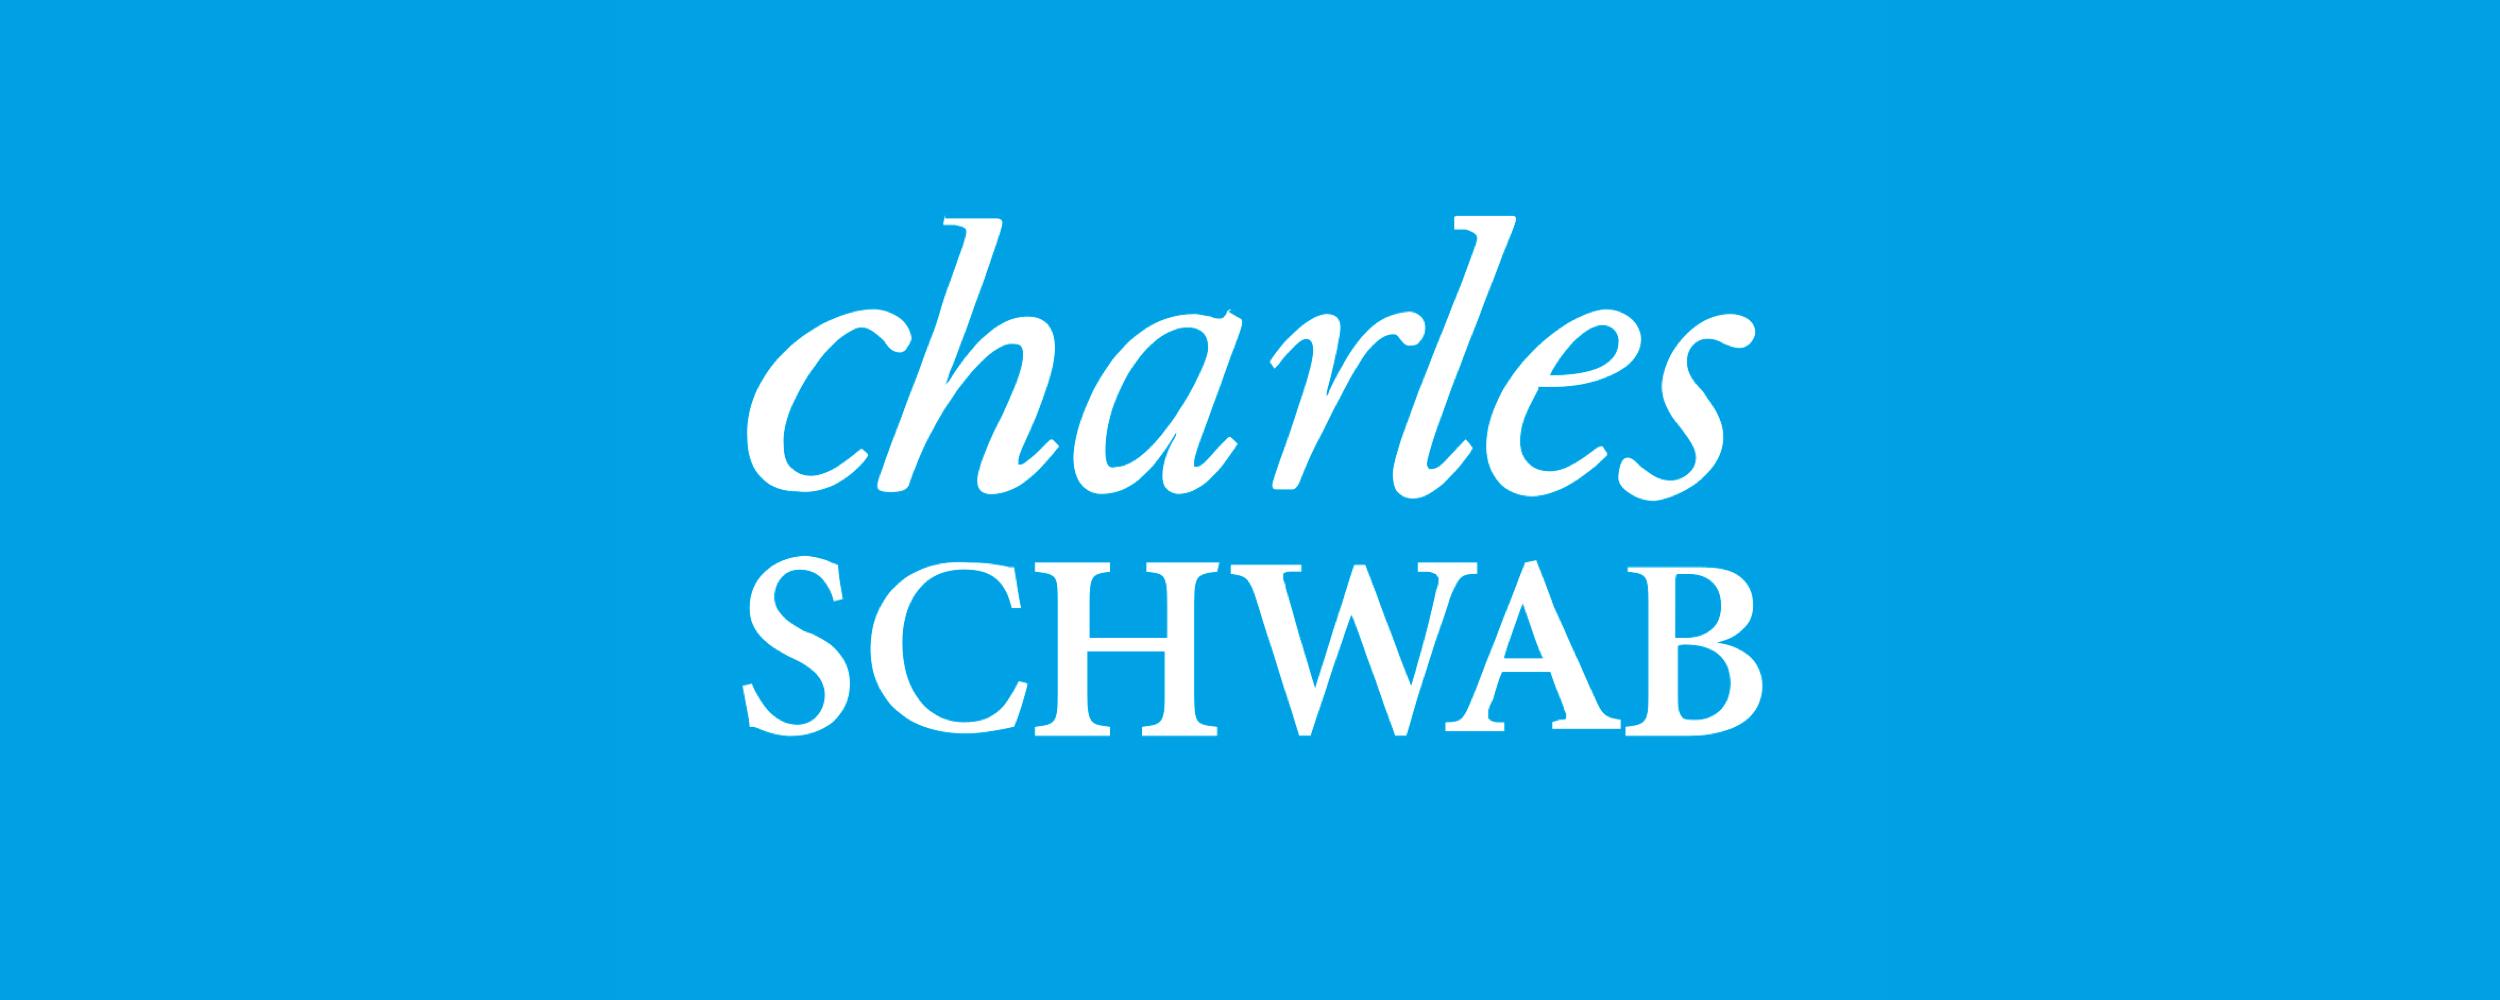 Charles Schwab Golden Valley, MN Channel Your Wealth